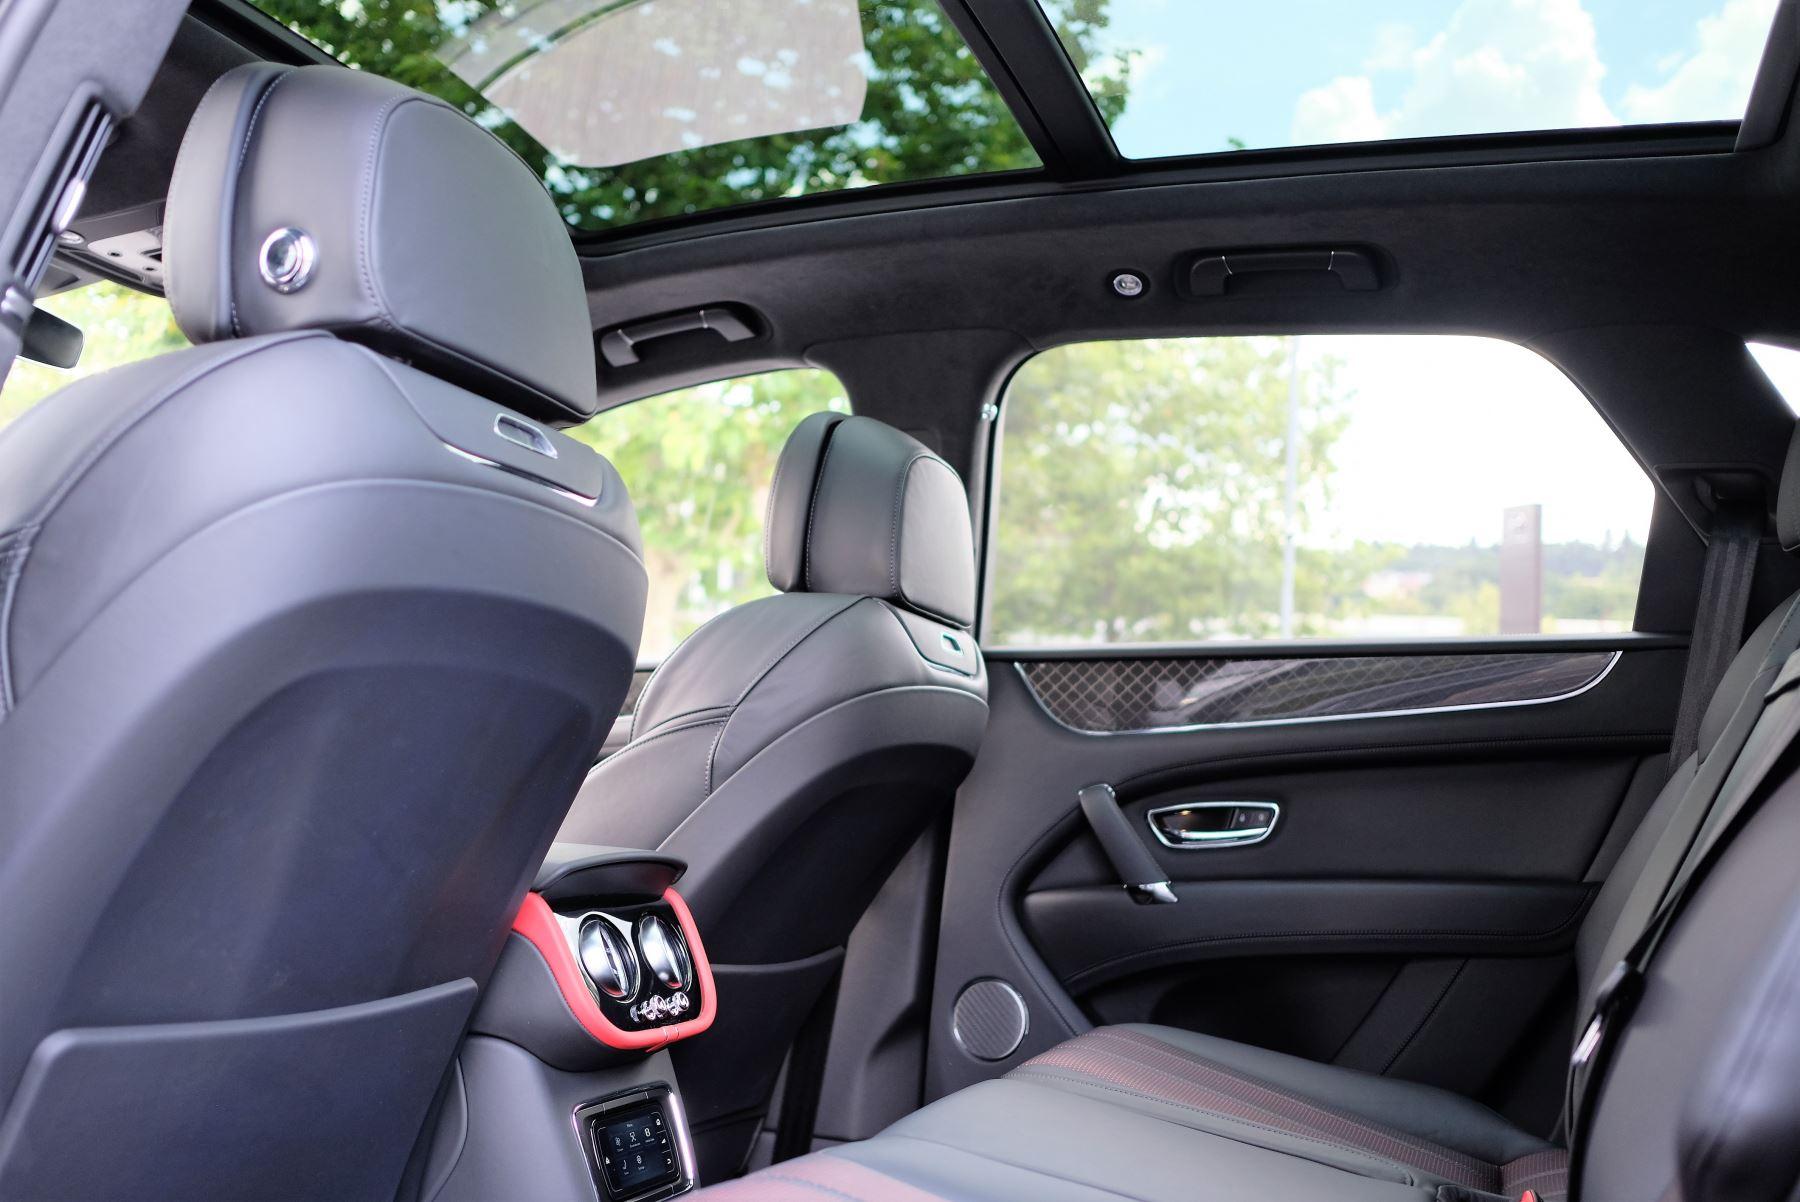 Bentley Bentayga V8 4.0 Design Series 5dr image 25